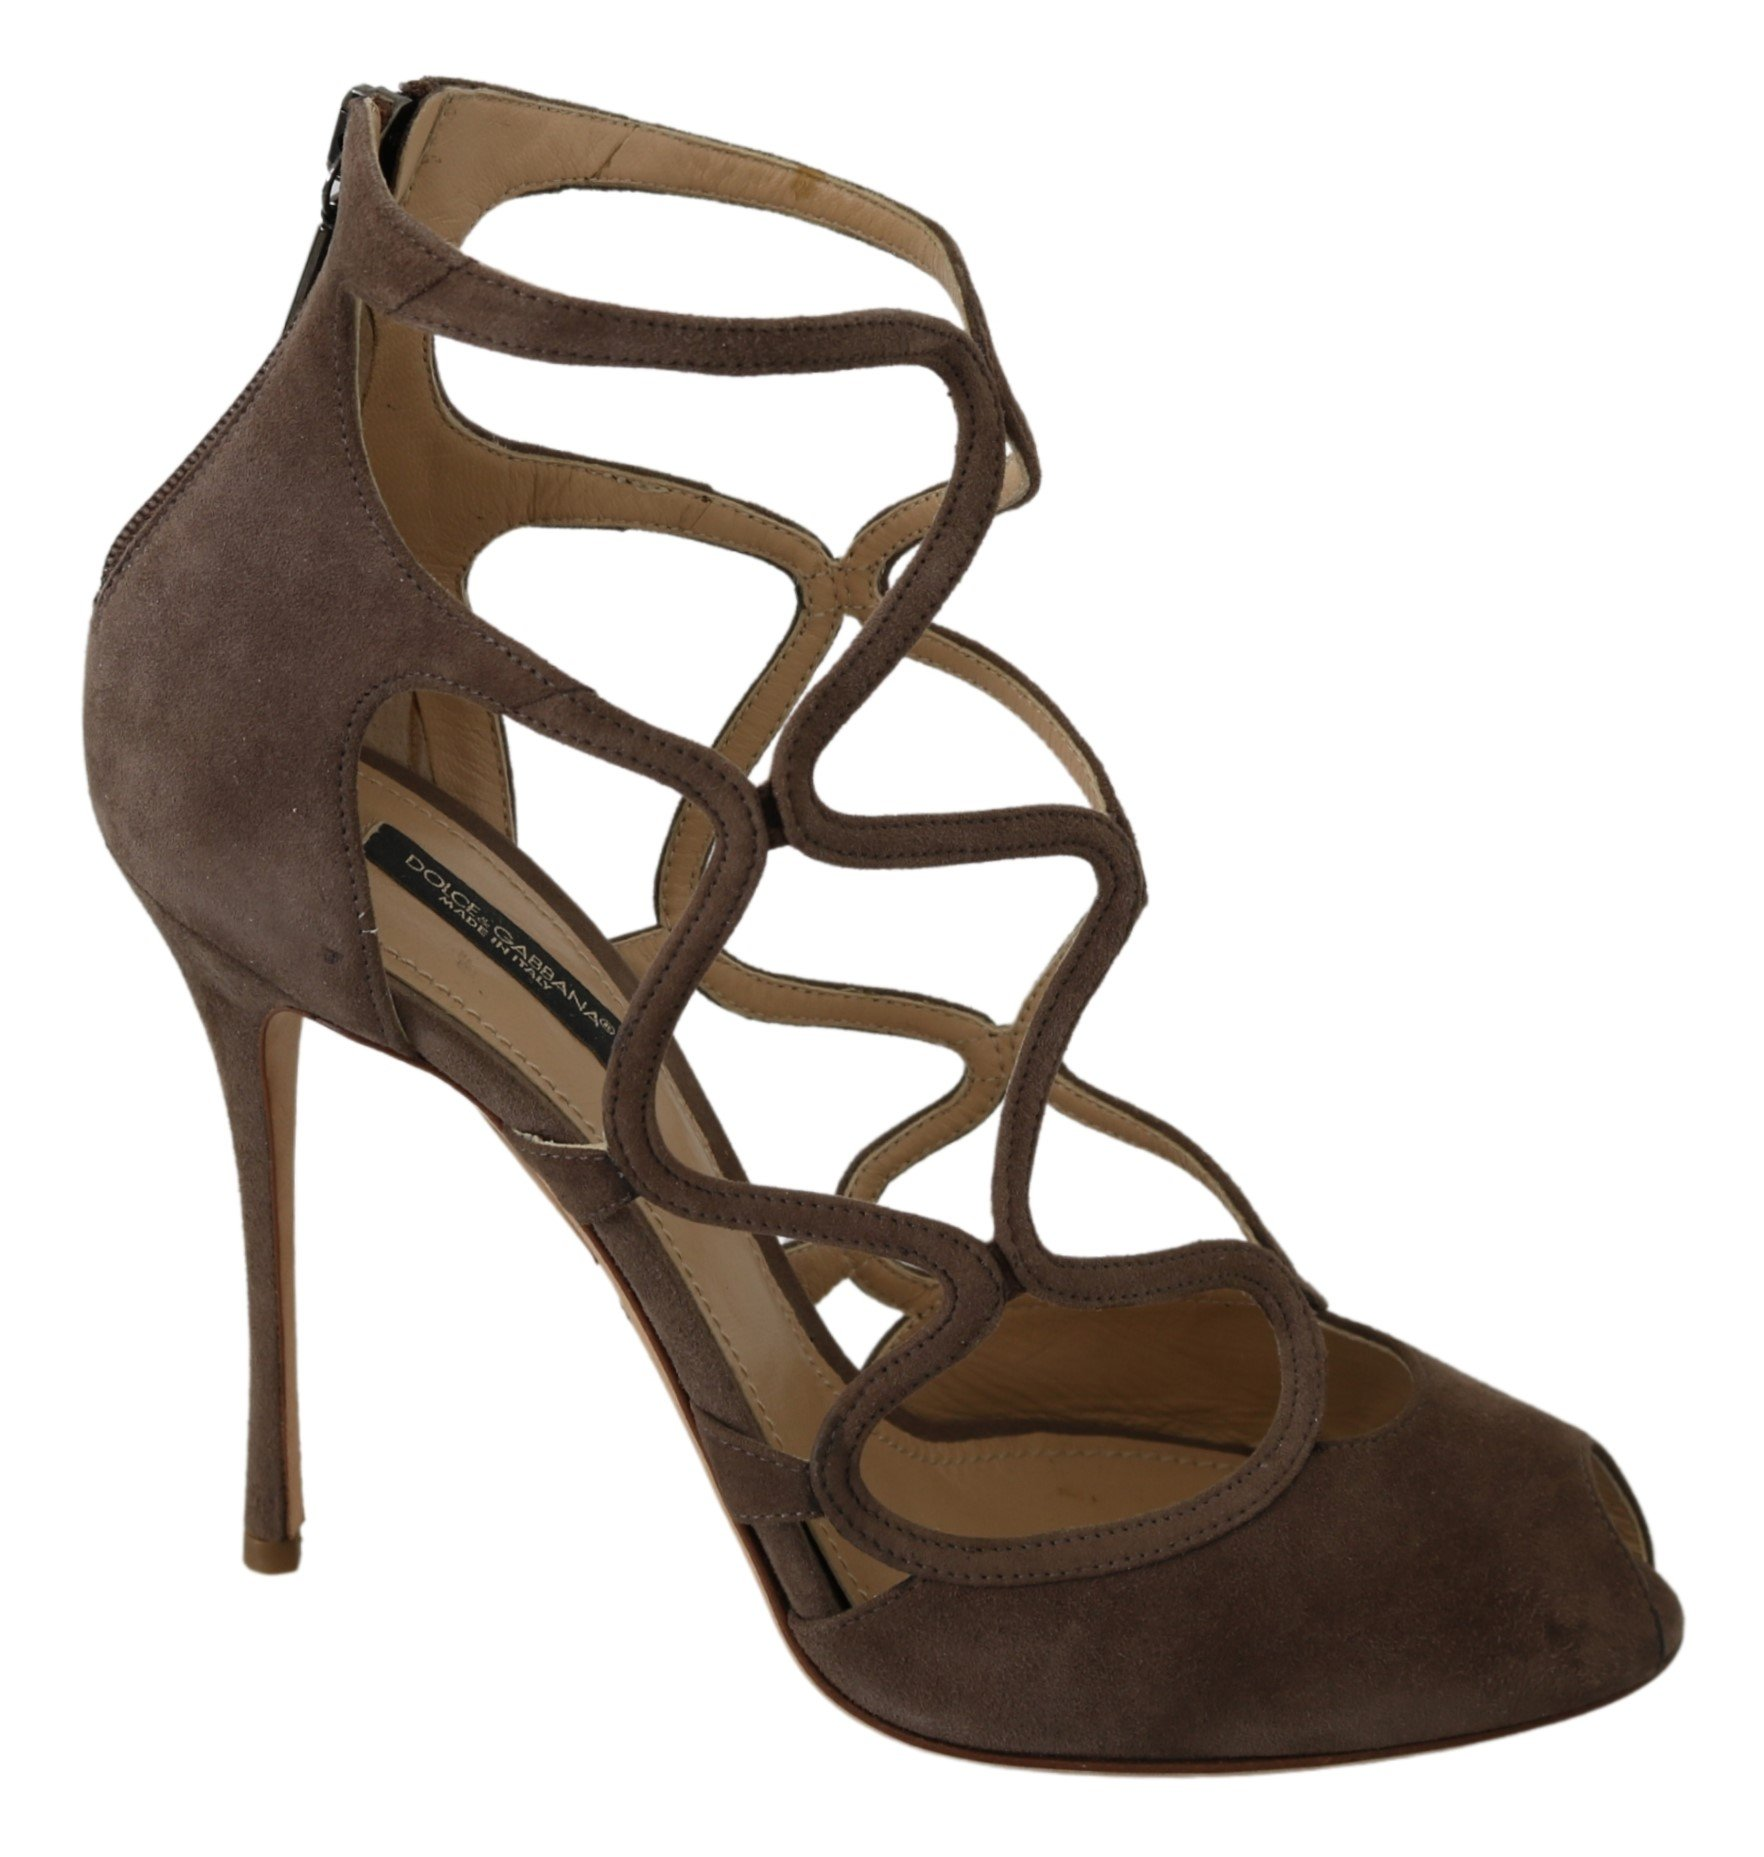 Dolce & Gabbana Women's Suede Stiletto Pumps Beige LA7365 - EU39/US8.5